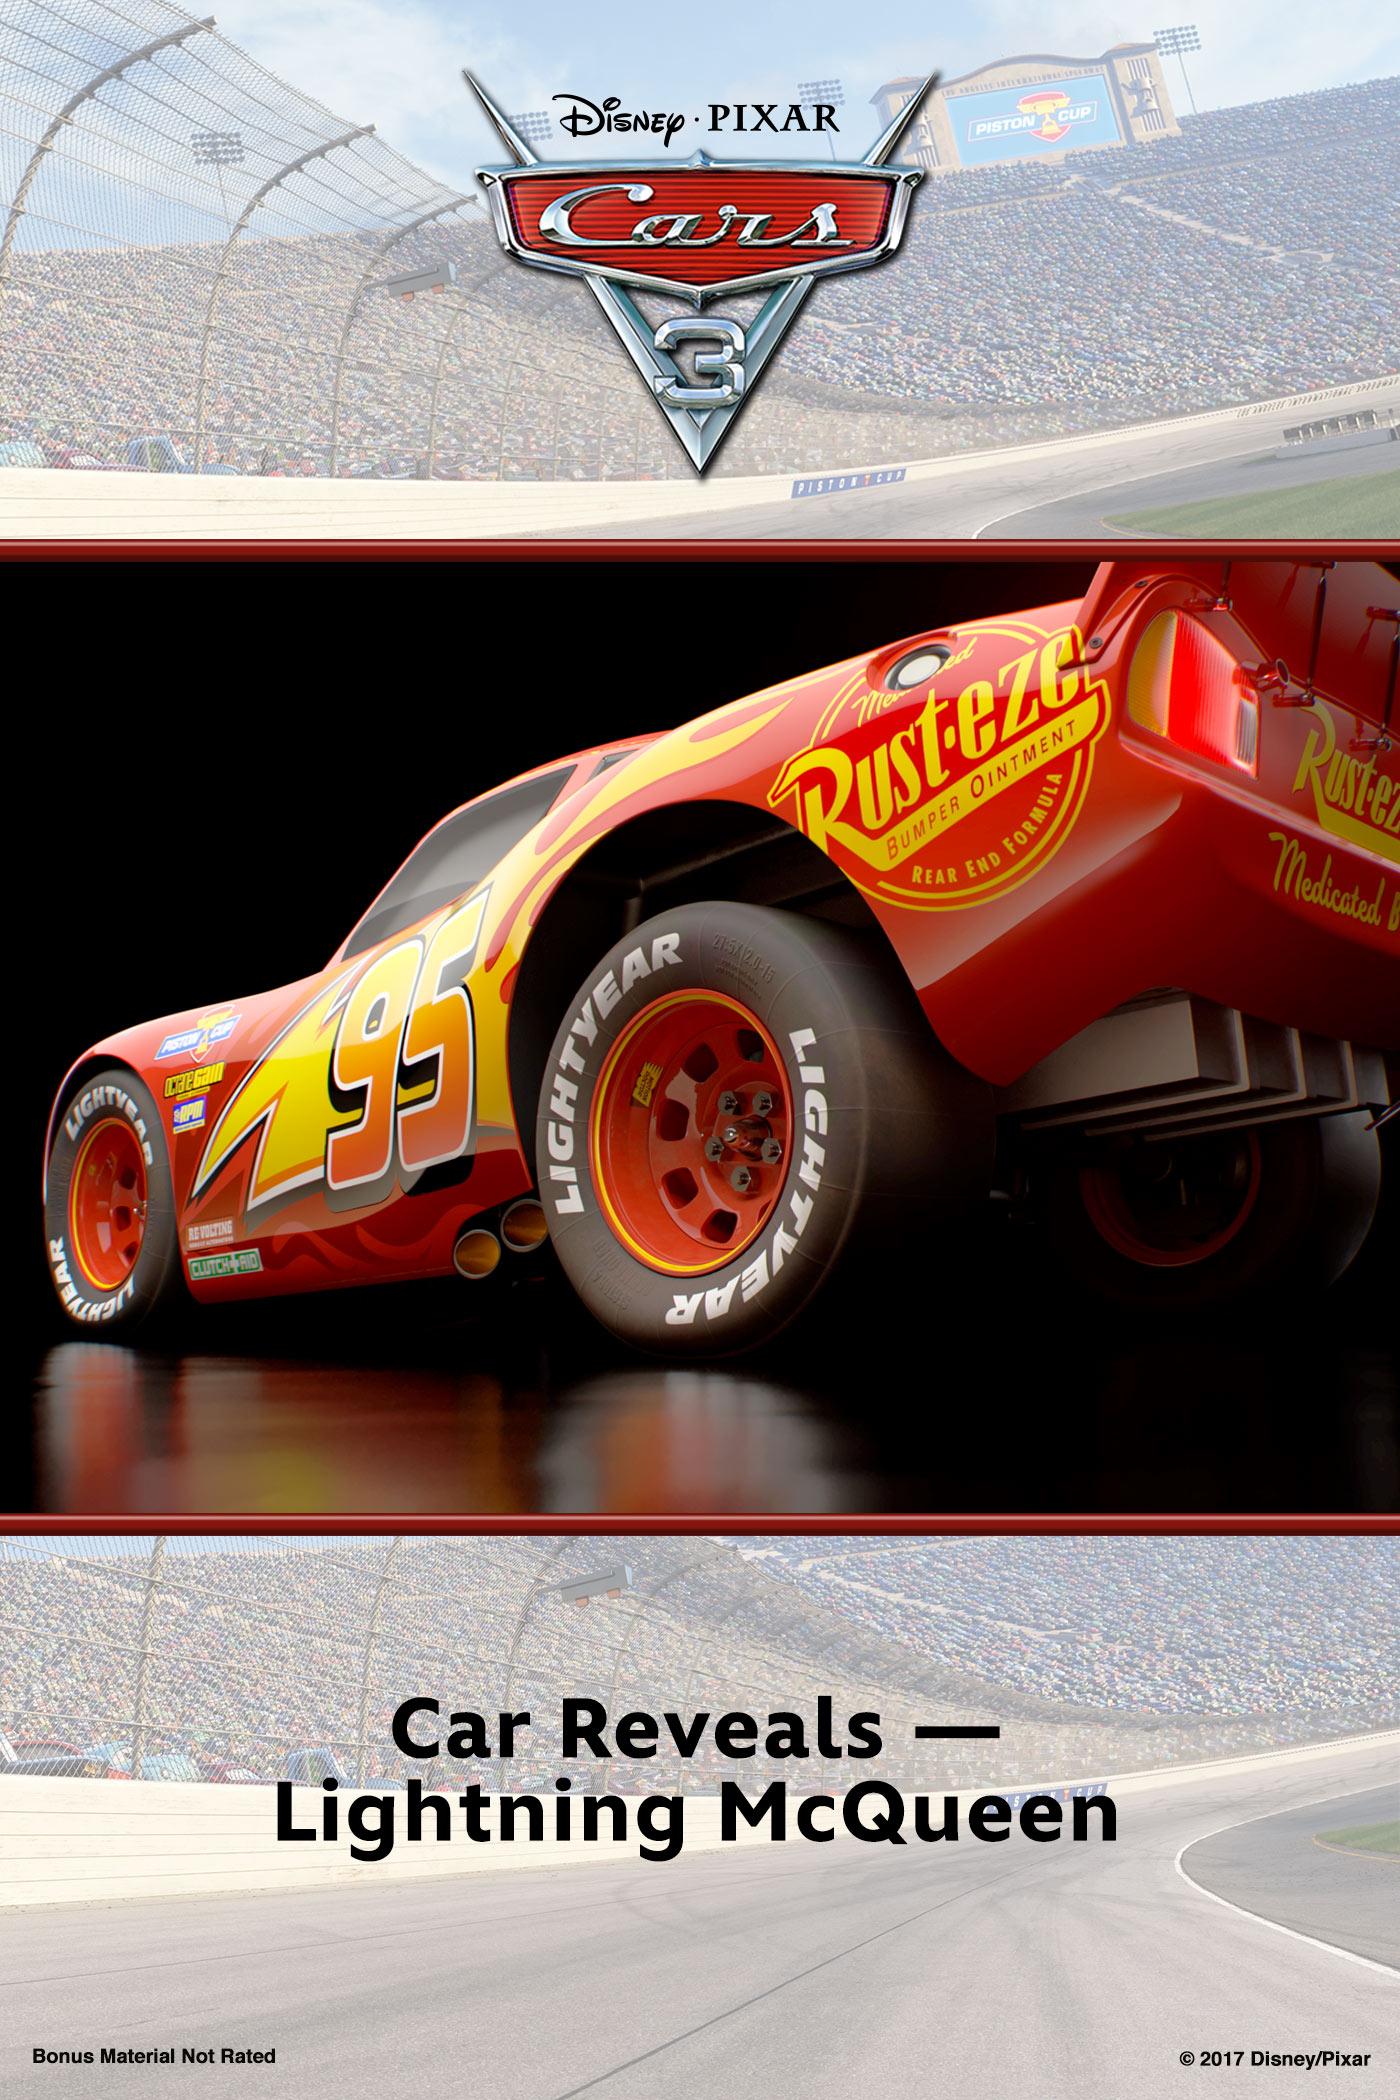 Car Reveals: Cars 3